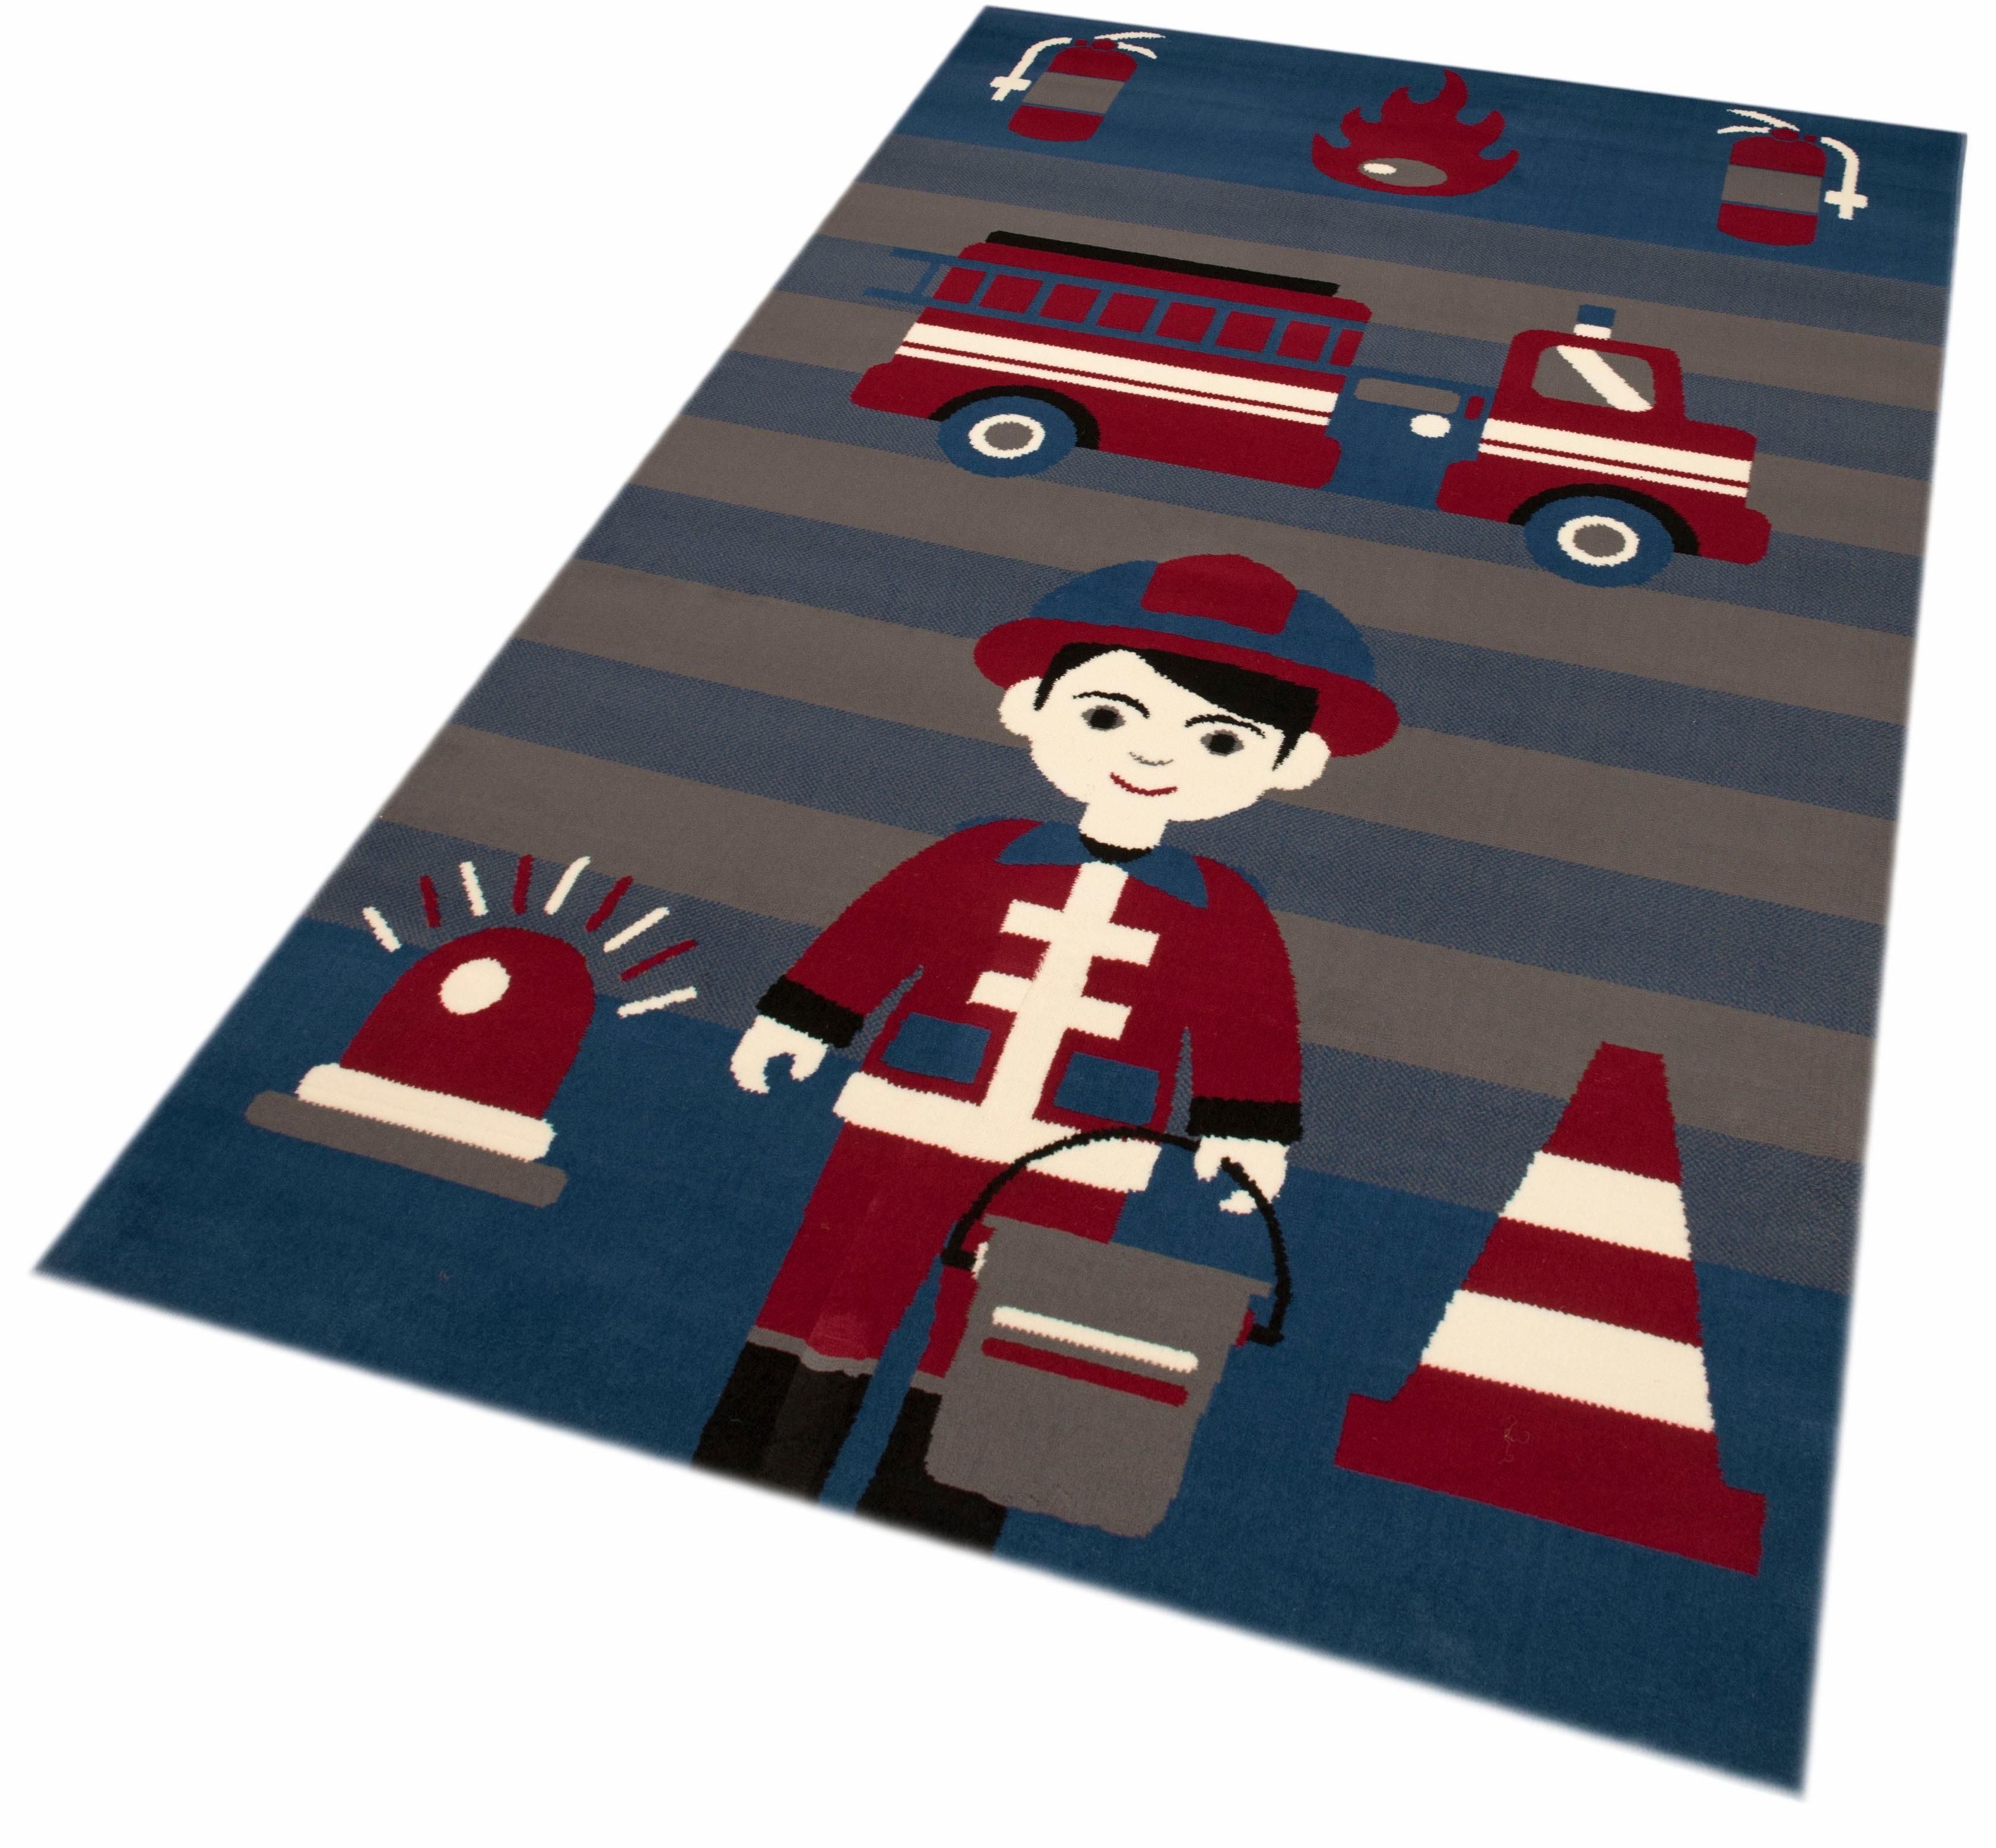 Kinderteppich »Feuerwehrmann«, Zala Living, rechteckig, Höhe 9 mm